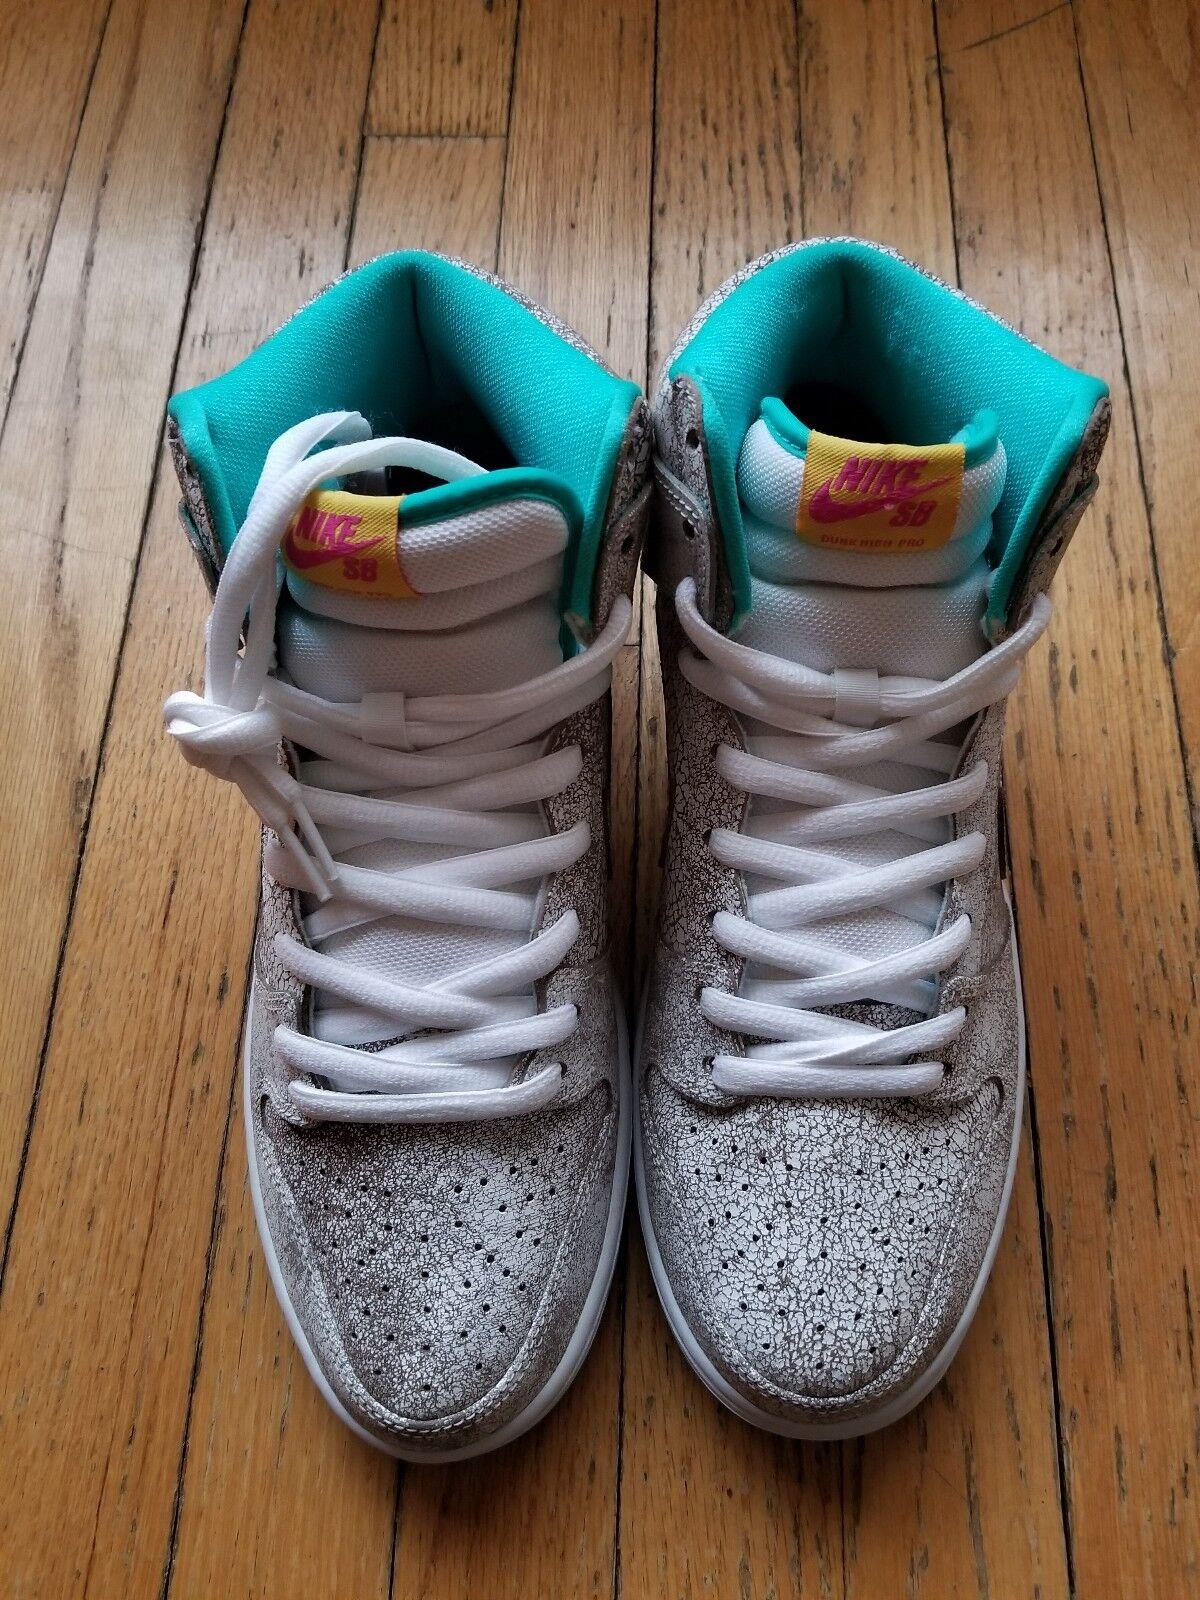 Brand New Nike Zoom Air Gym shoes